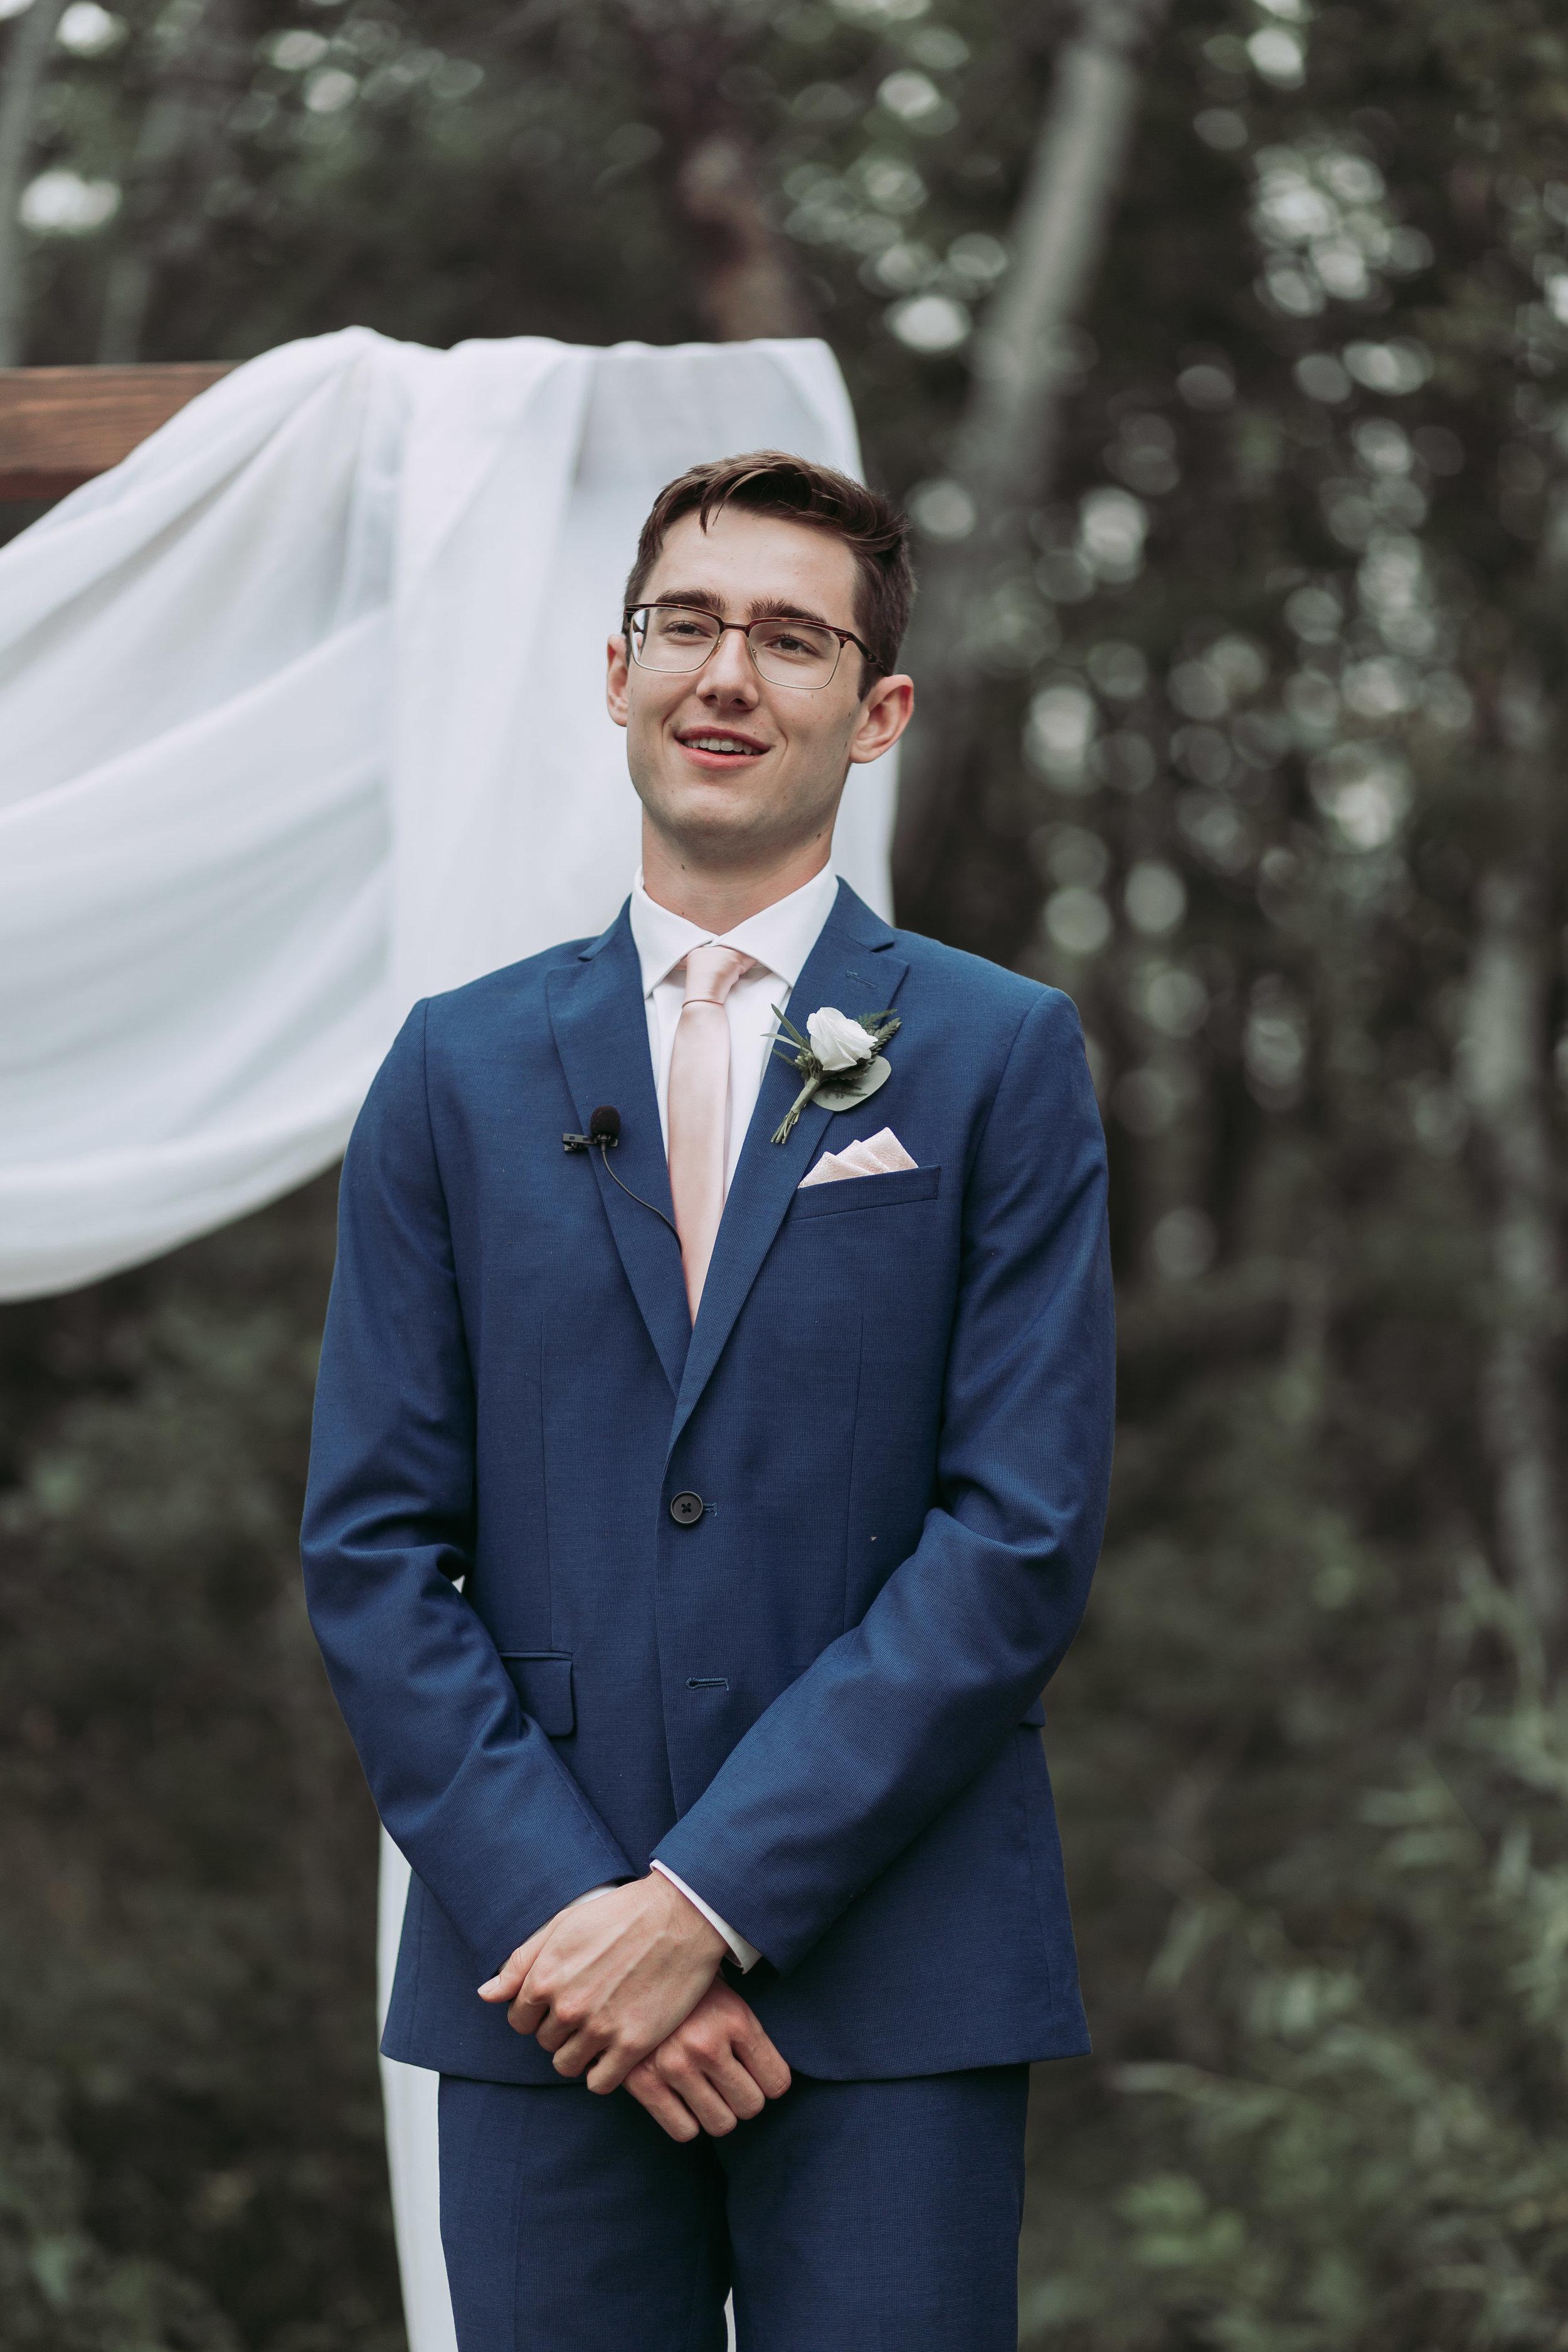 Wedding Day-402.jpg